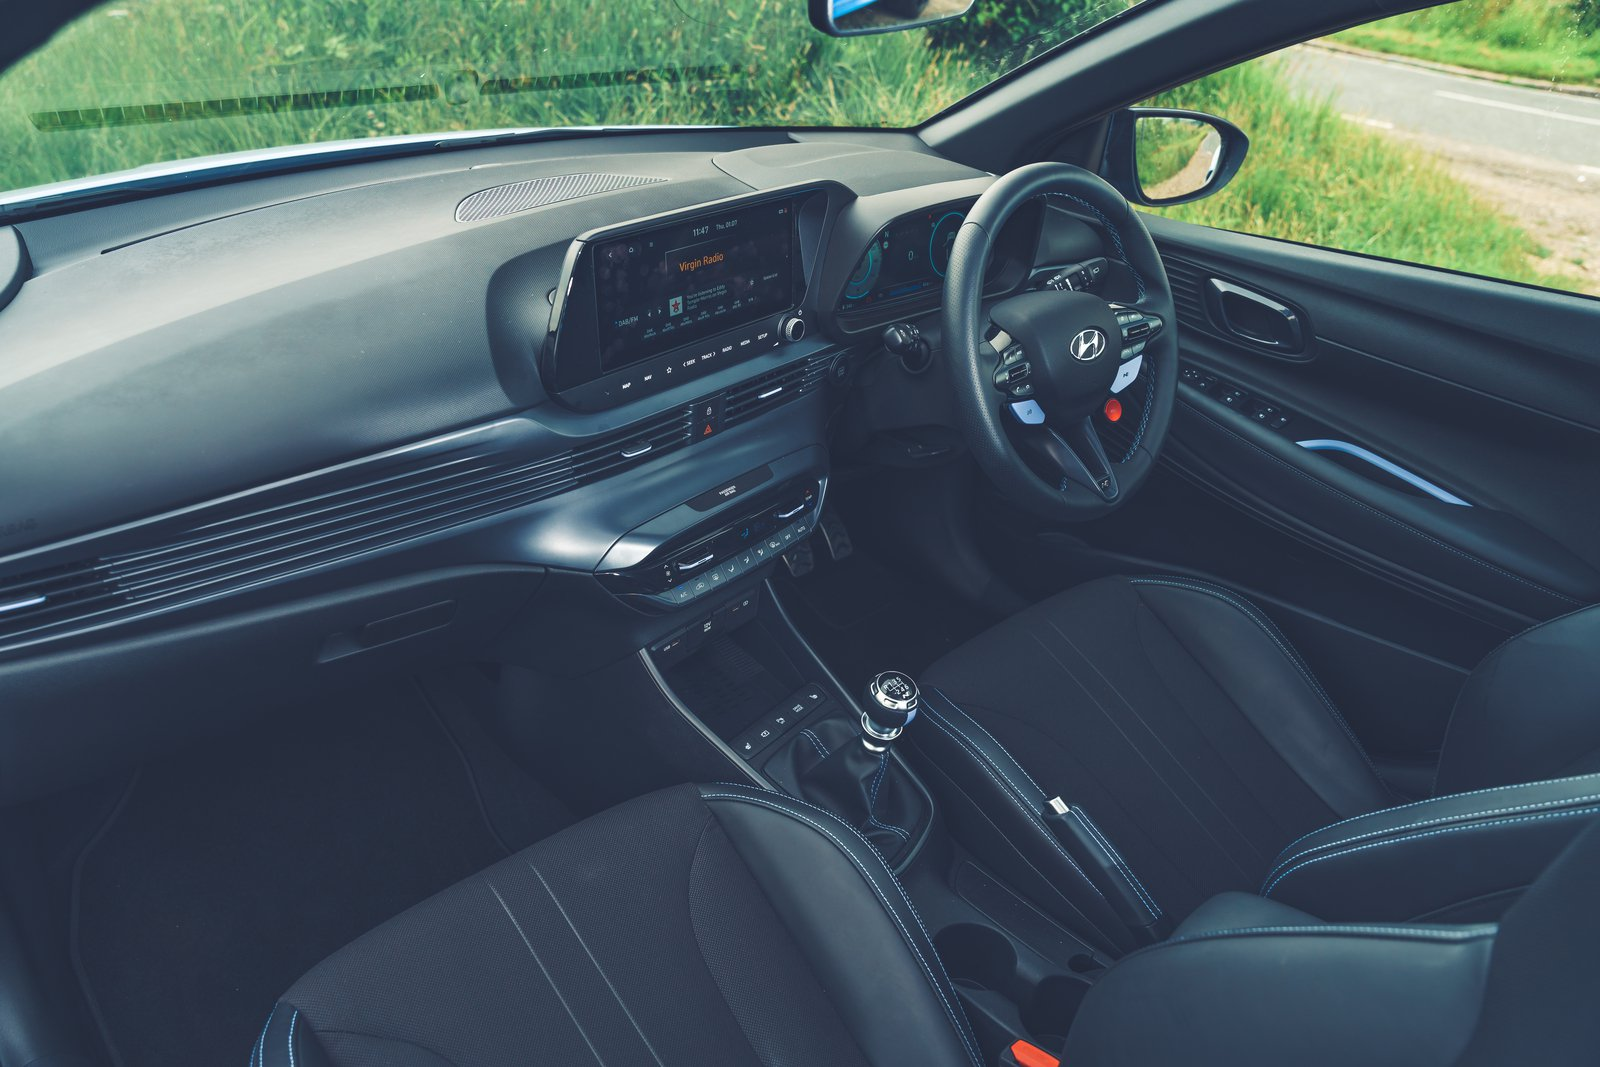 Hyundai i20 N 2021 interior dashboard